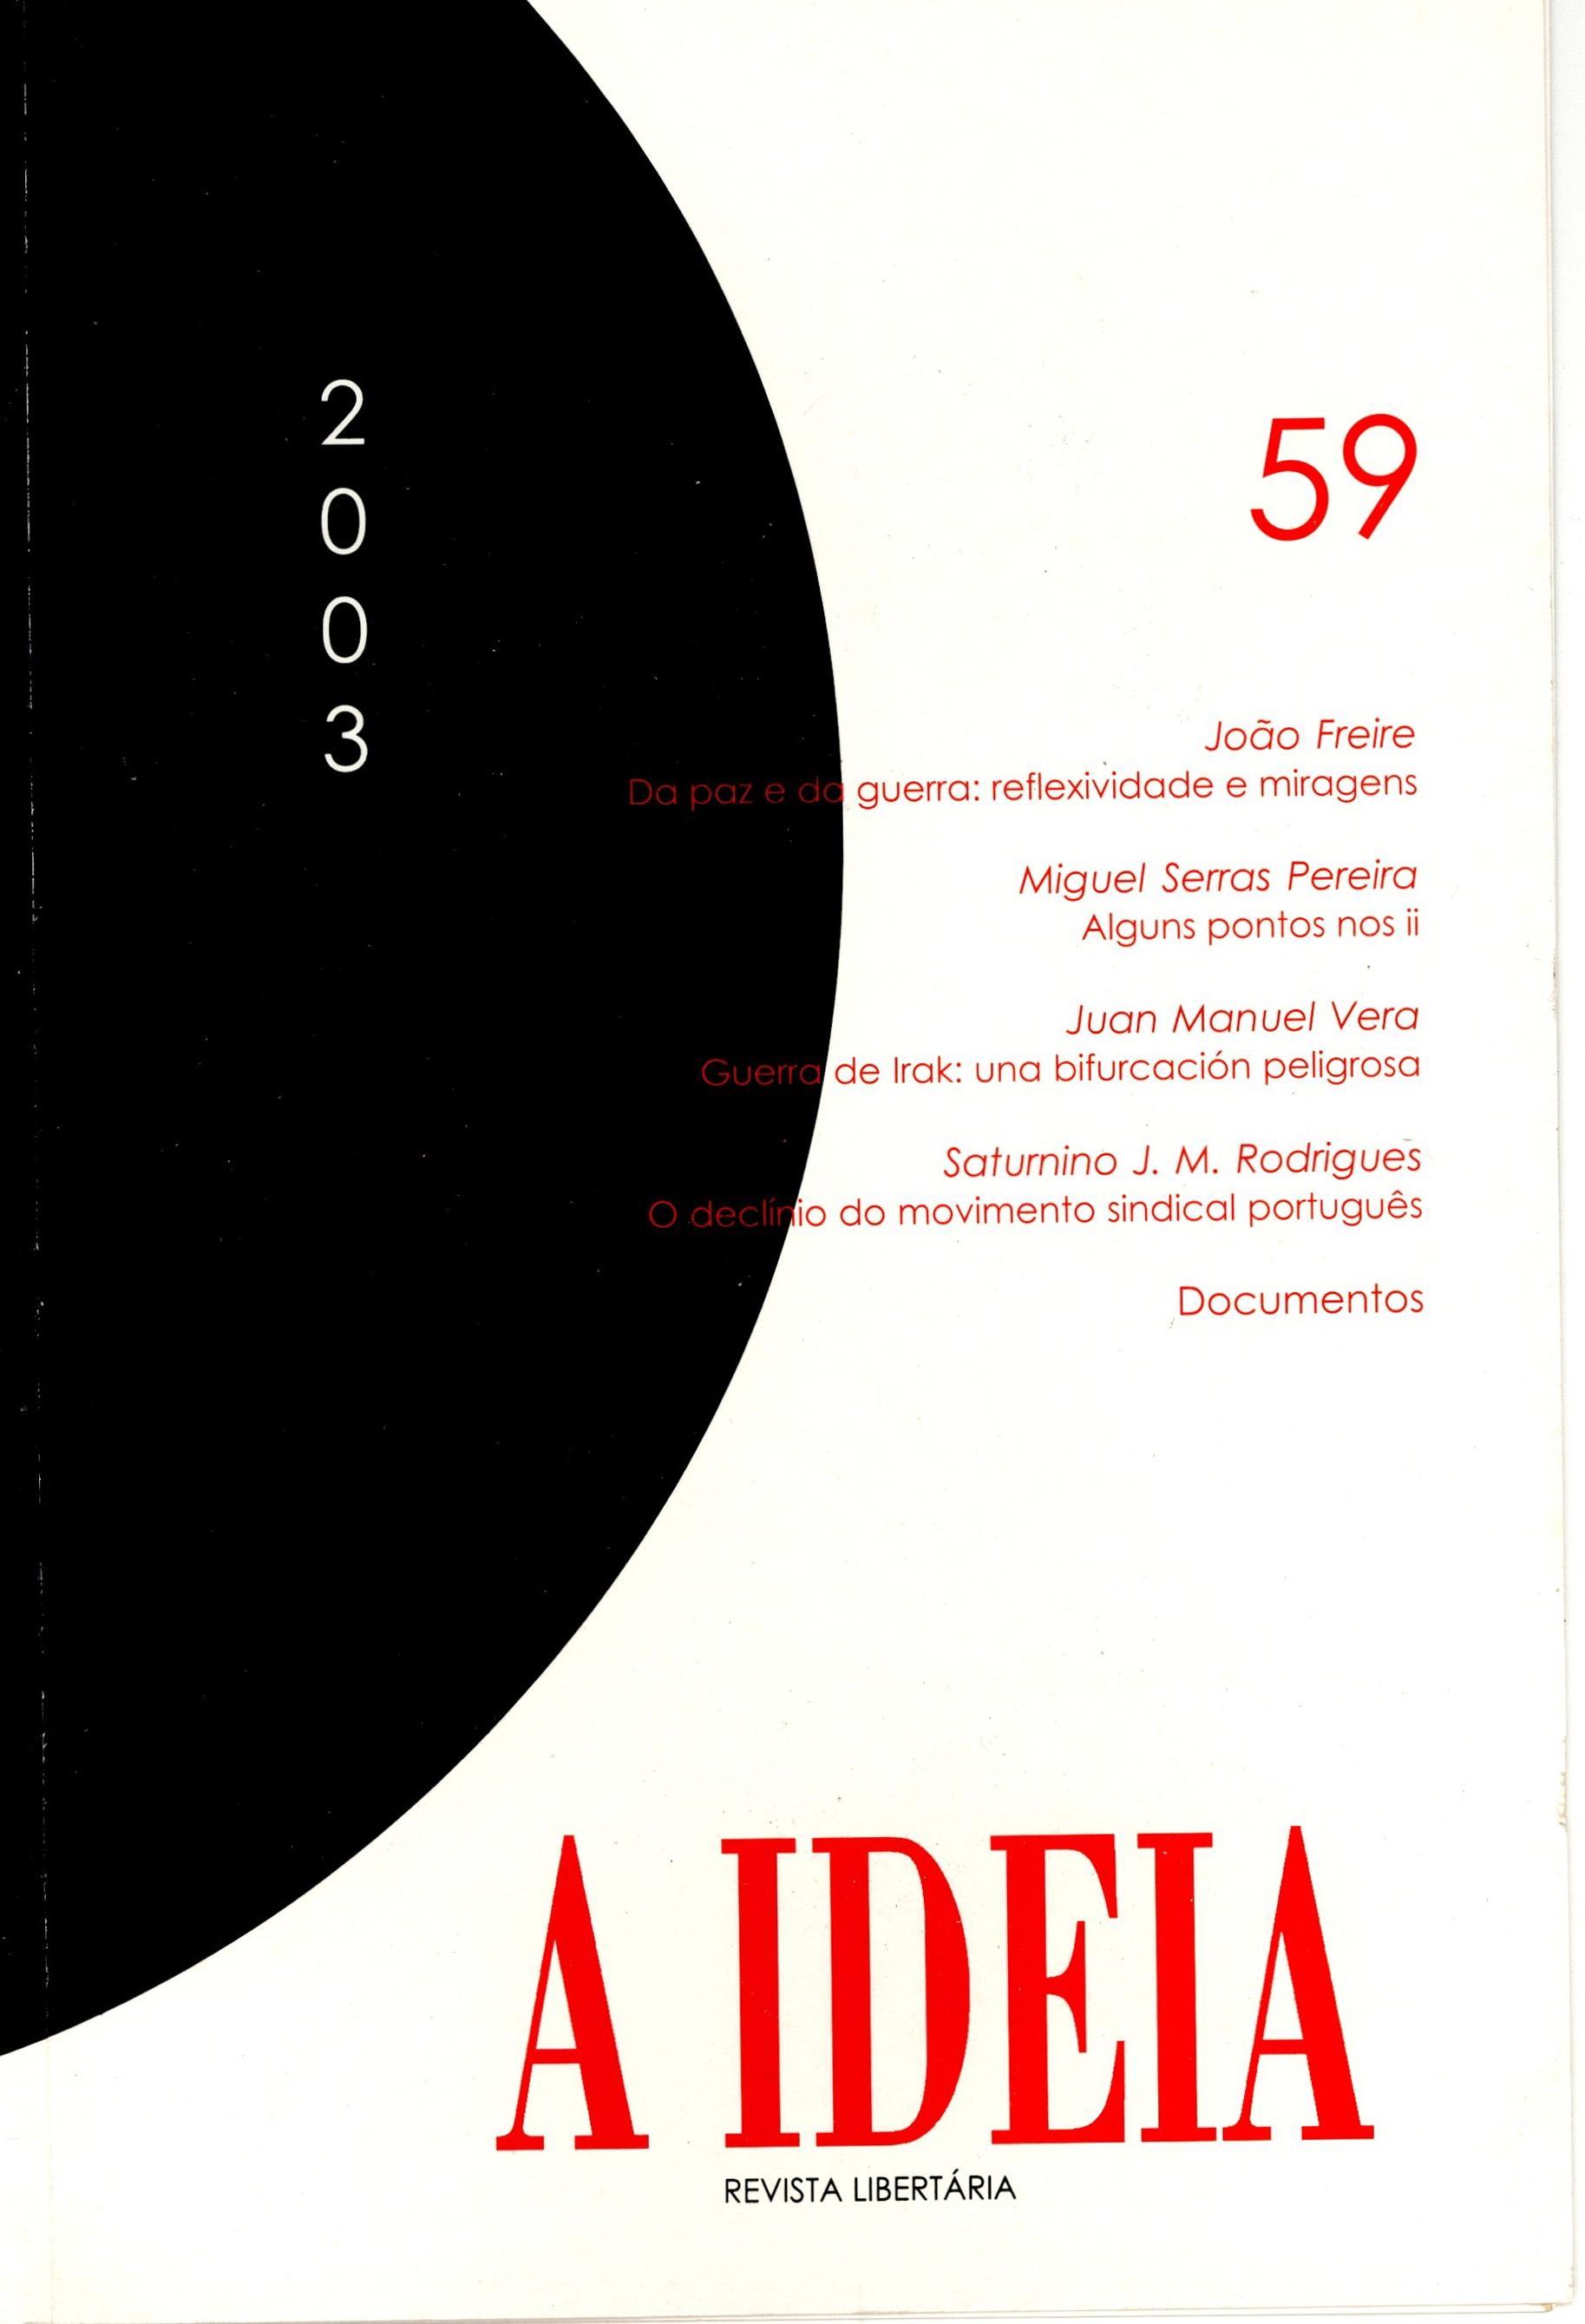 A_Ideia_II_4_59_capa